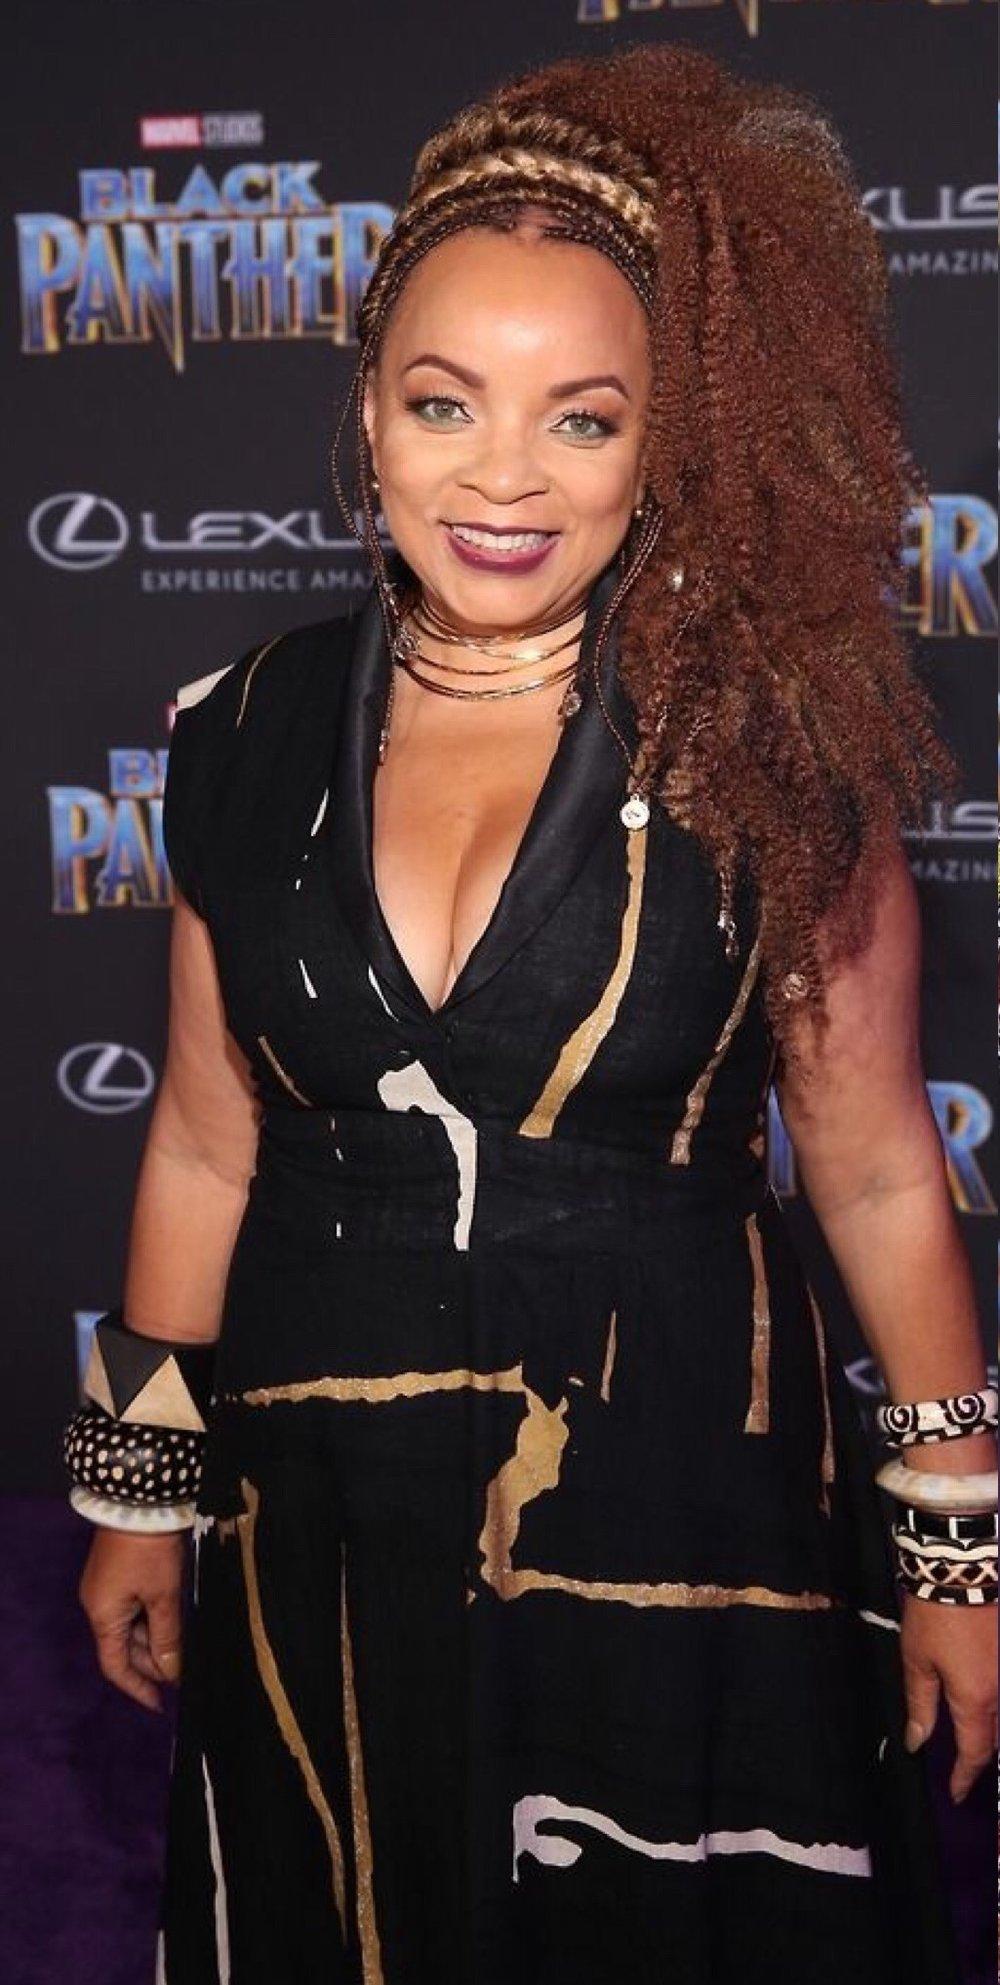 'Black Panther' costume designer Ruth Carter wore Mantsho to the movie's premier.